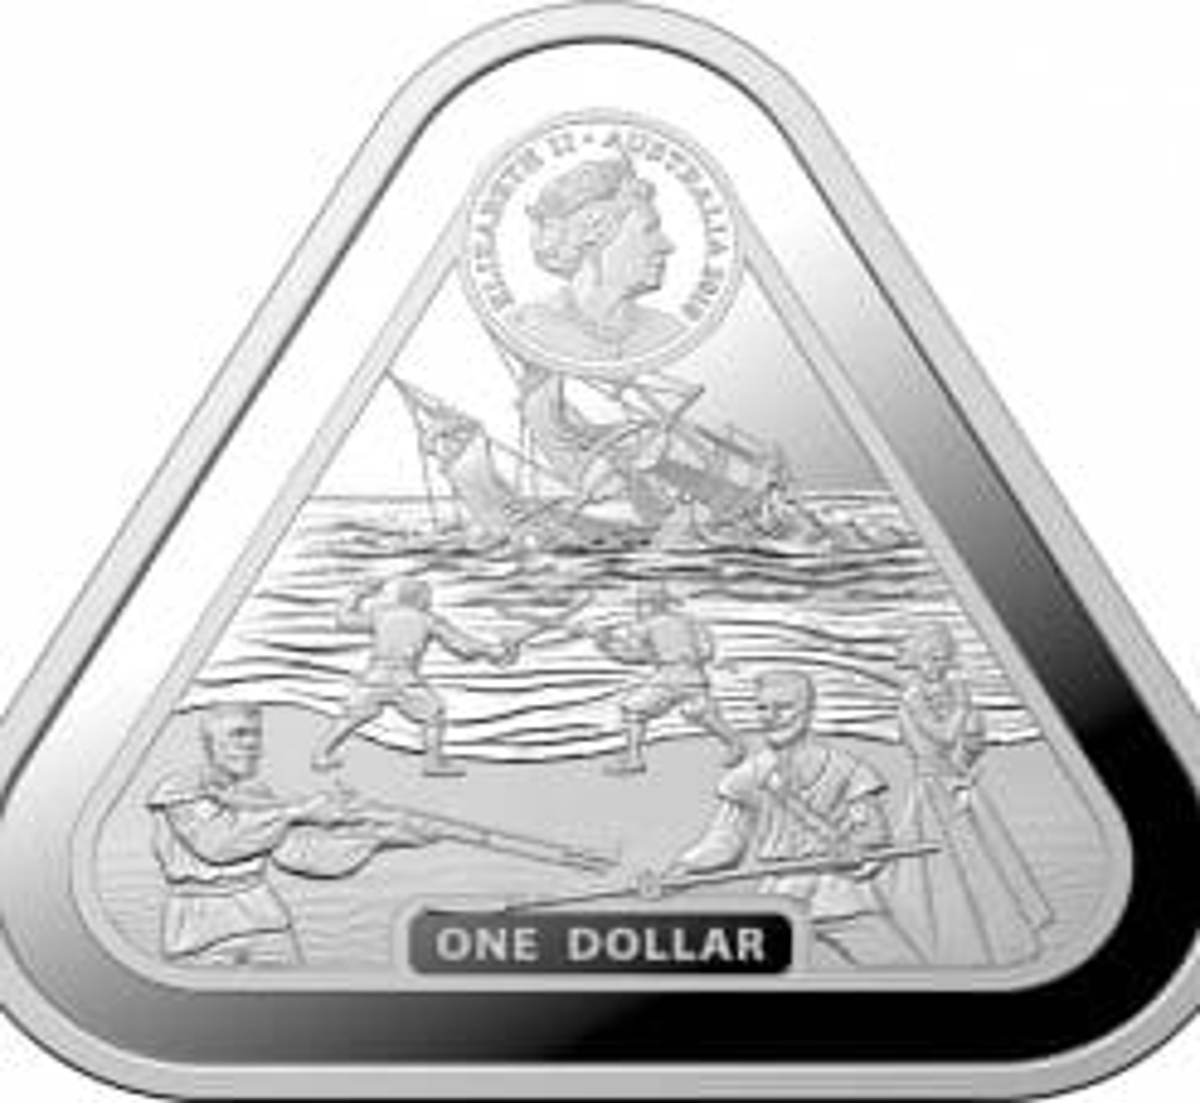 2019 Batavia 1oz Silver Bullion Coin 3